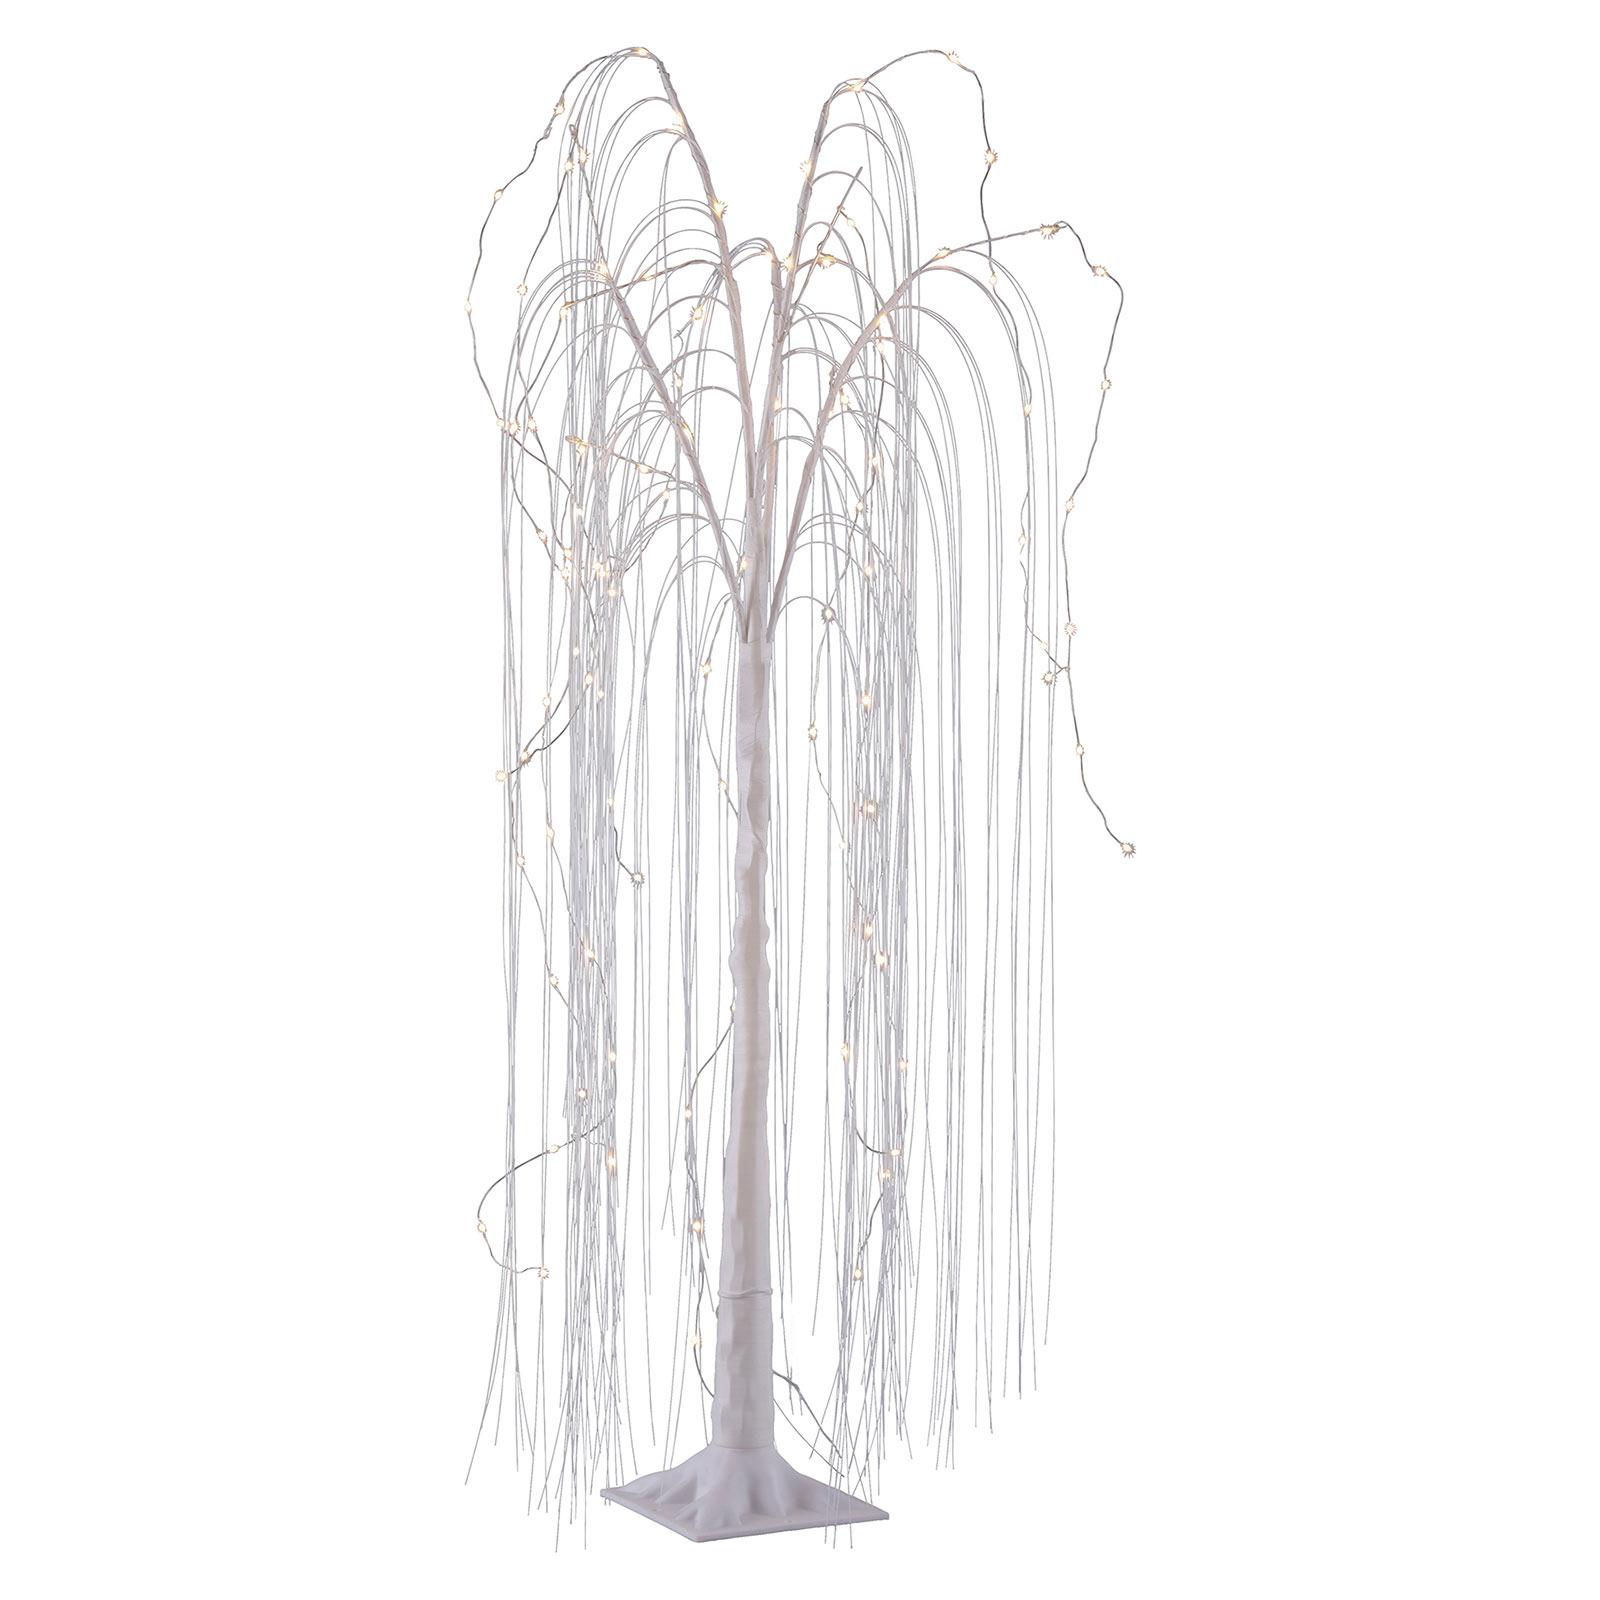 LED-dekorationslampa Willow, IP44, höjd 120 cm